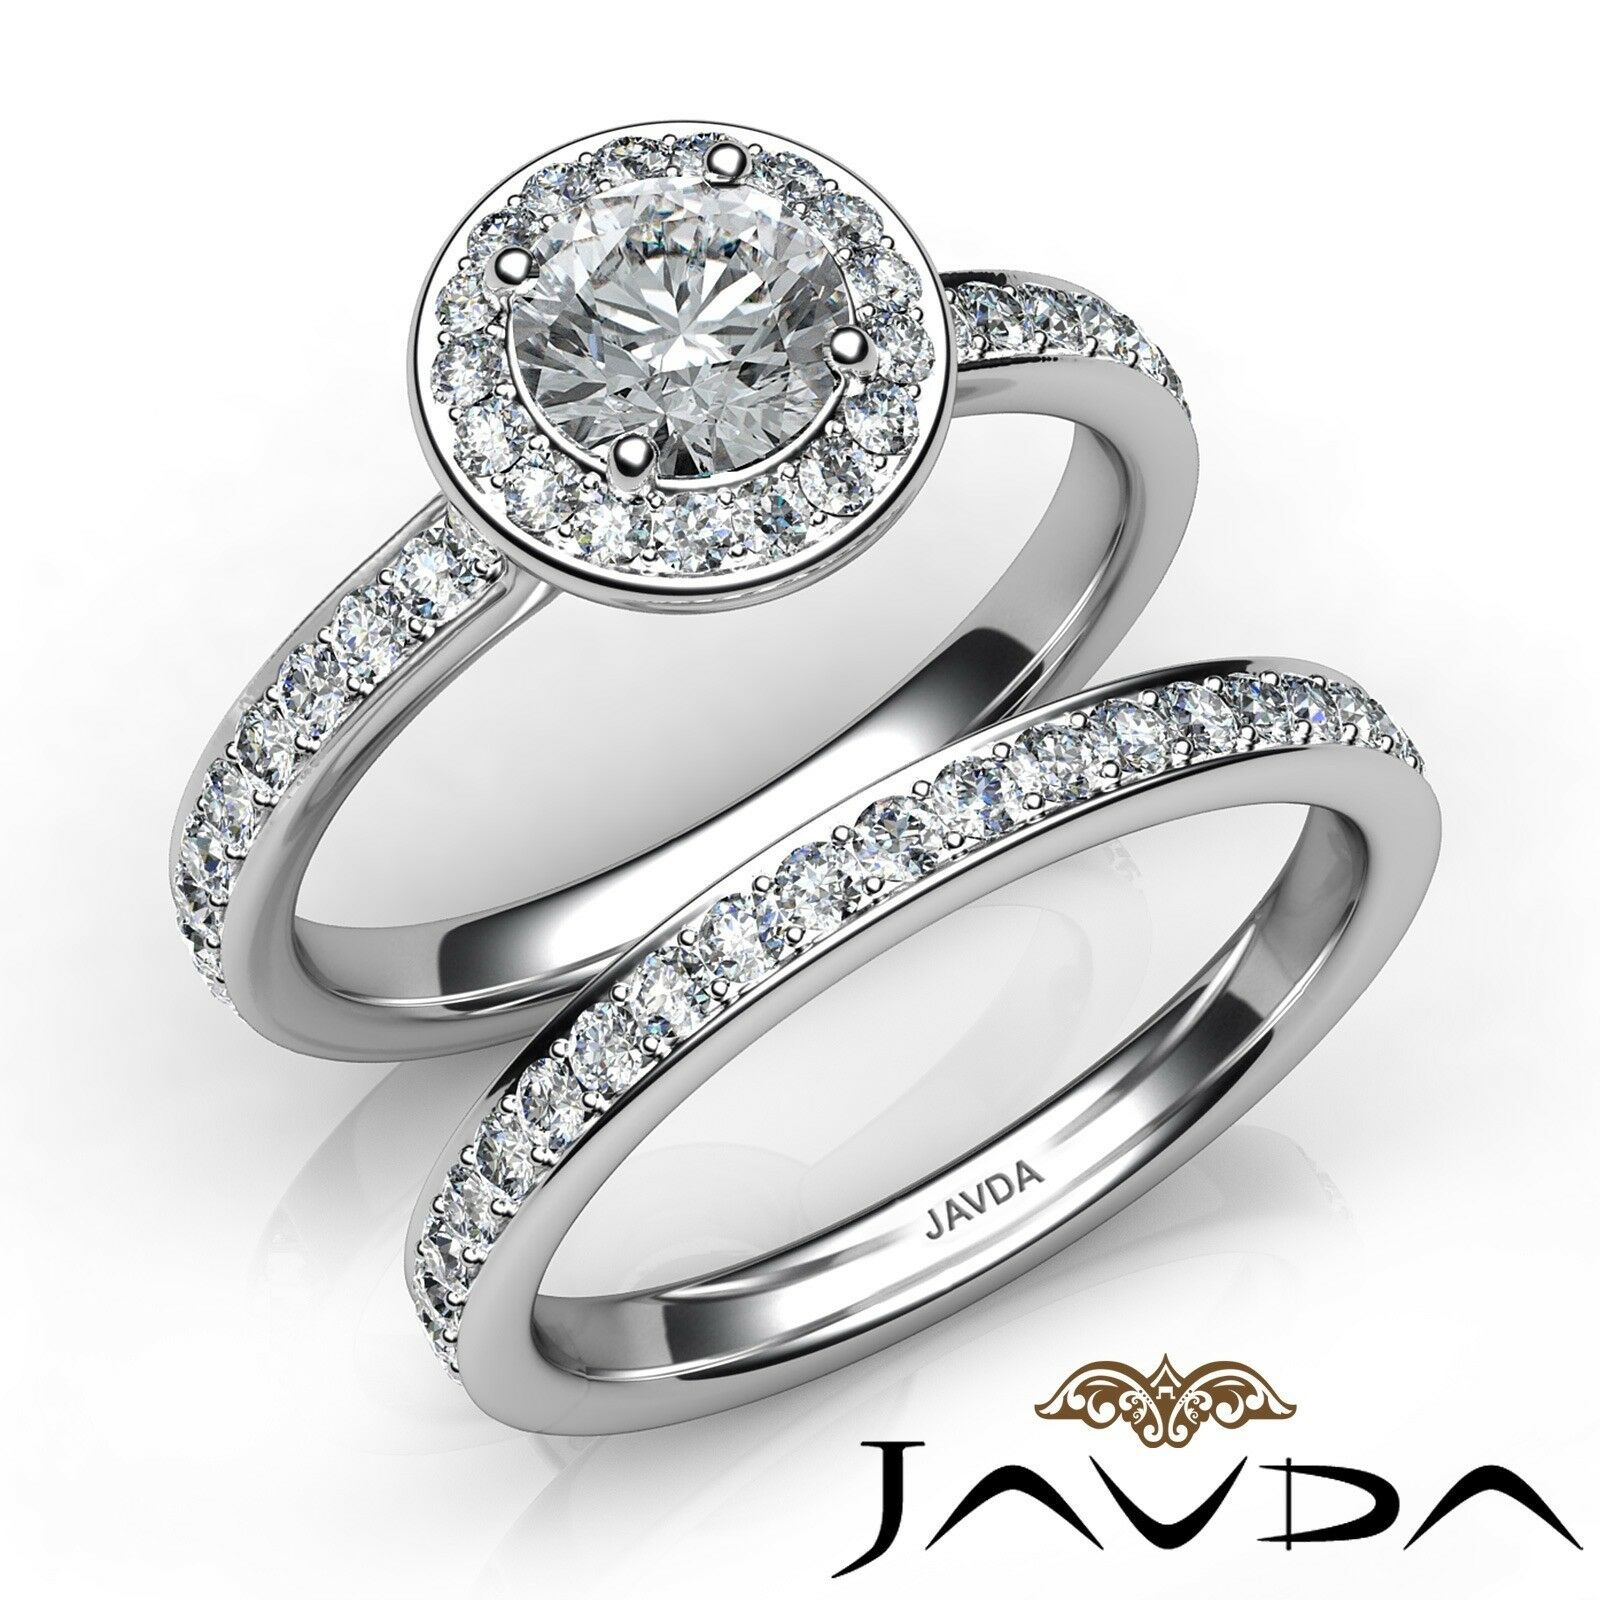 1.4ctw Halo Pave Set Wedding Round Diamond Engagement Ring GIA F-VVS2 White Gold